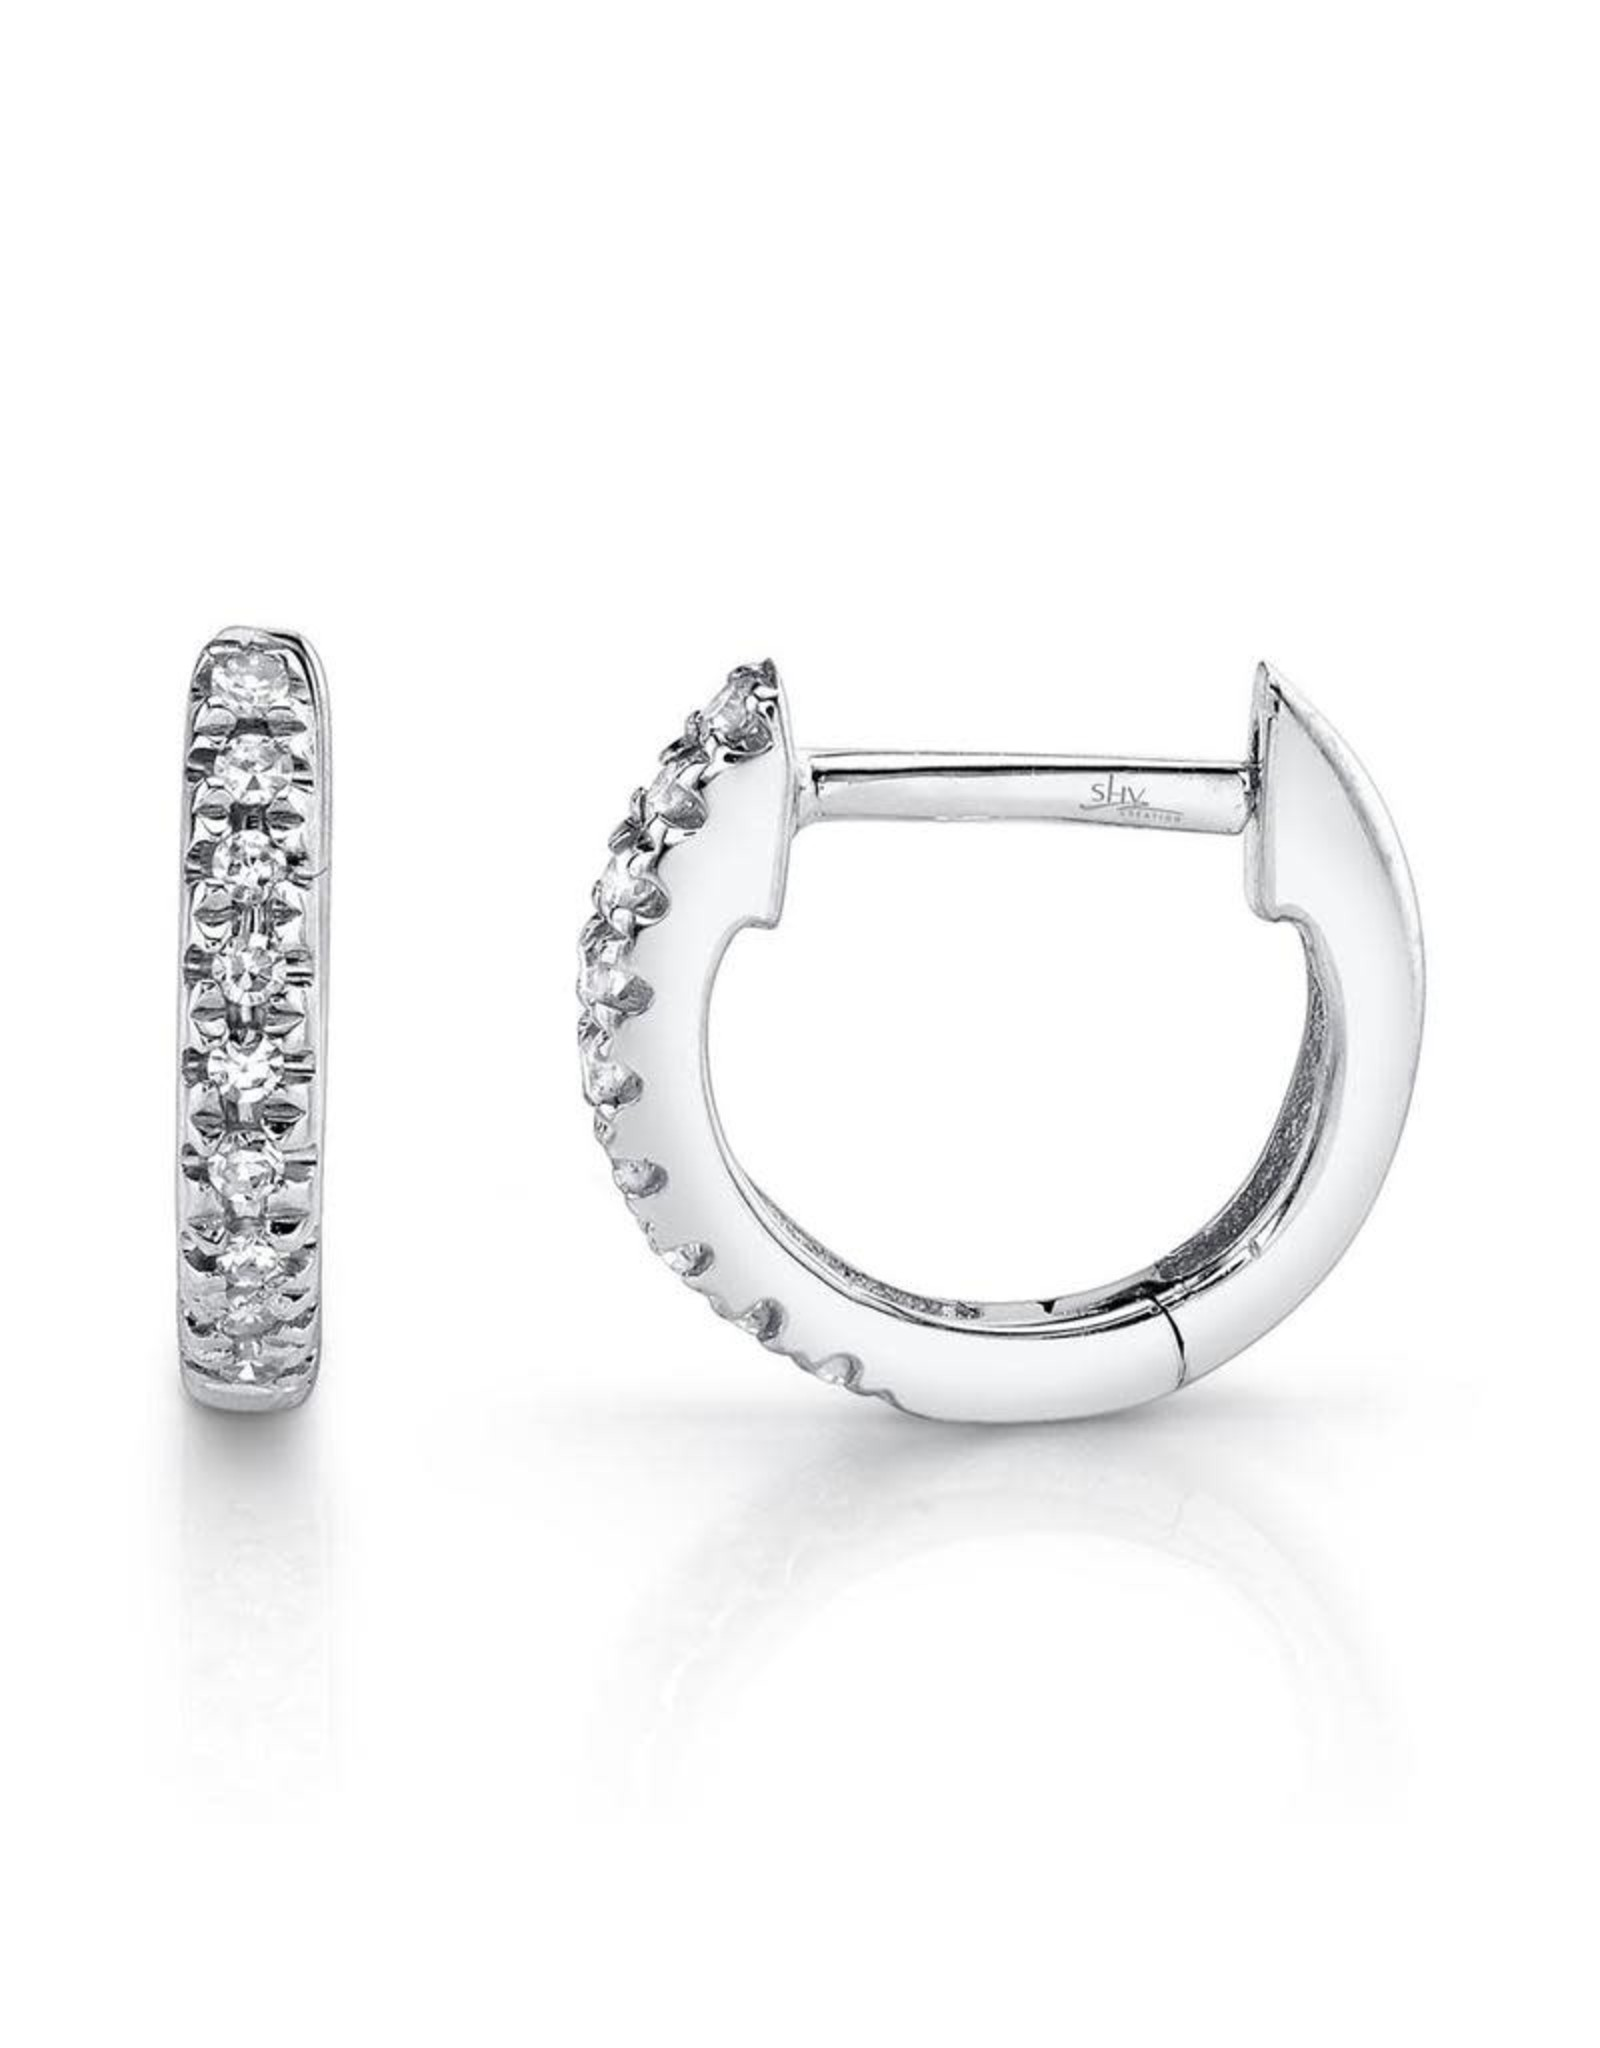 14K White Gold Petite Diamond Huggies, D: 0.04ct